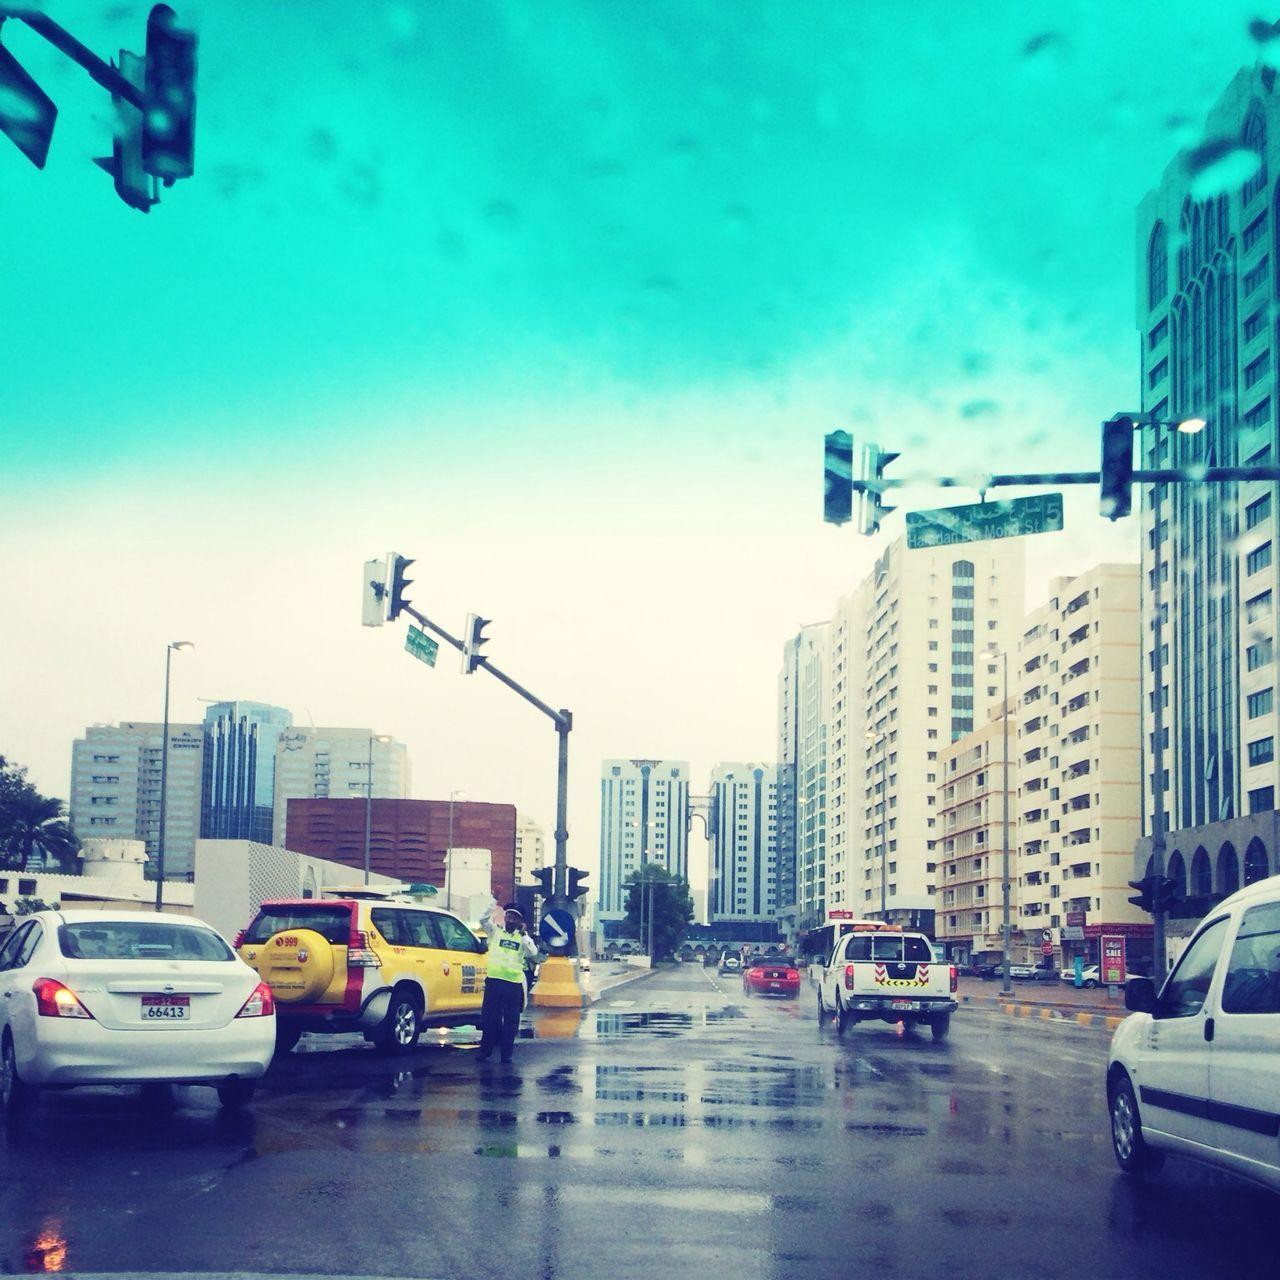 Rain day 1: Traffic system failure